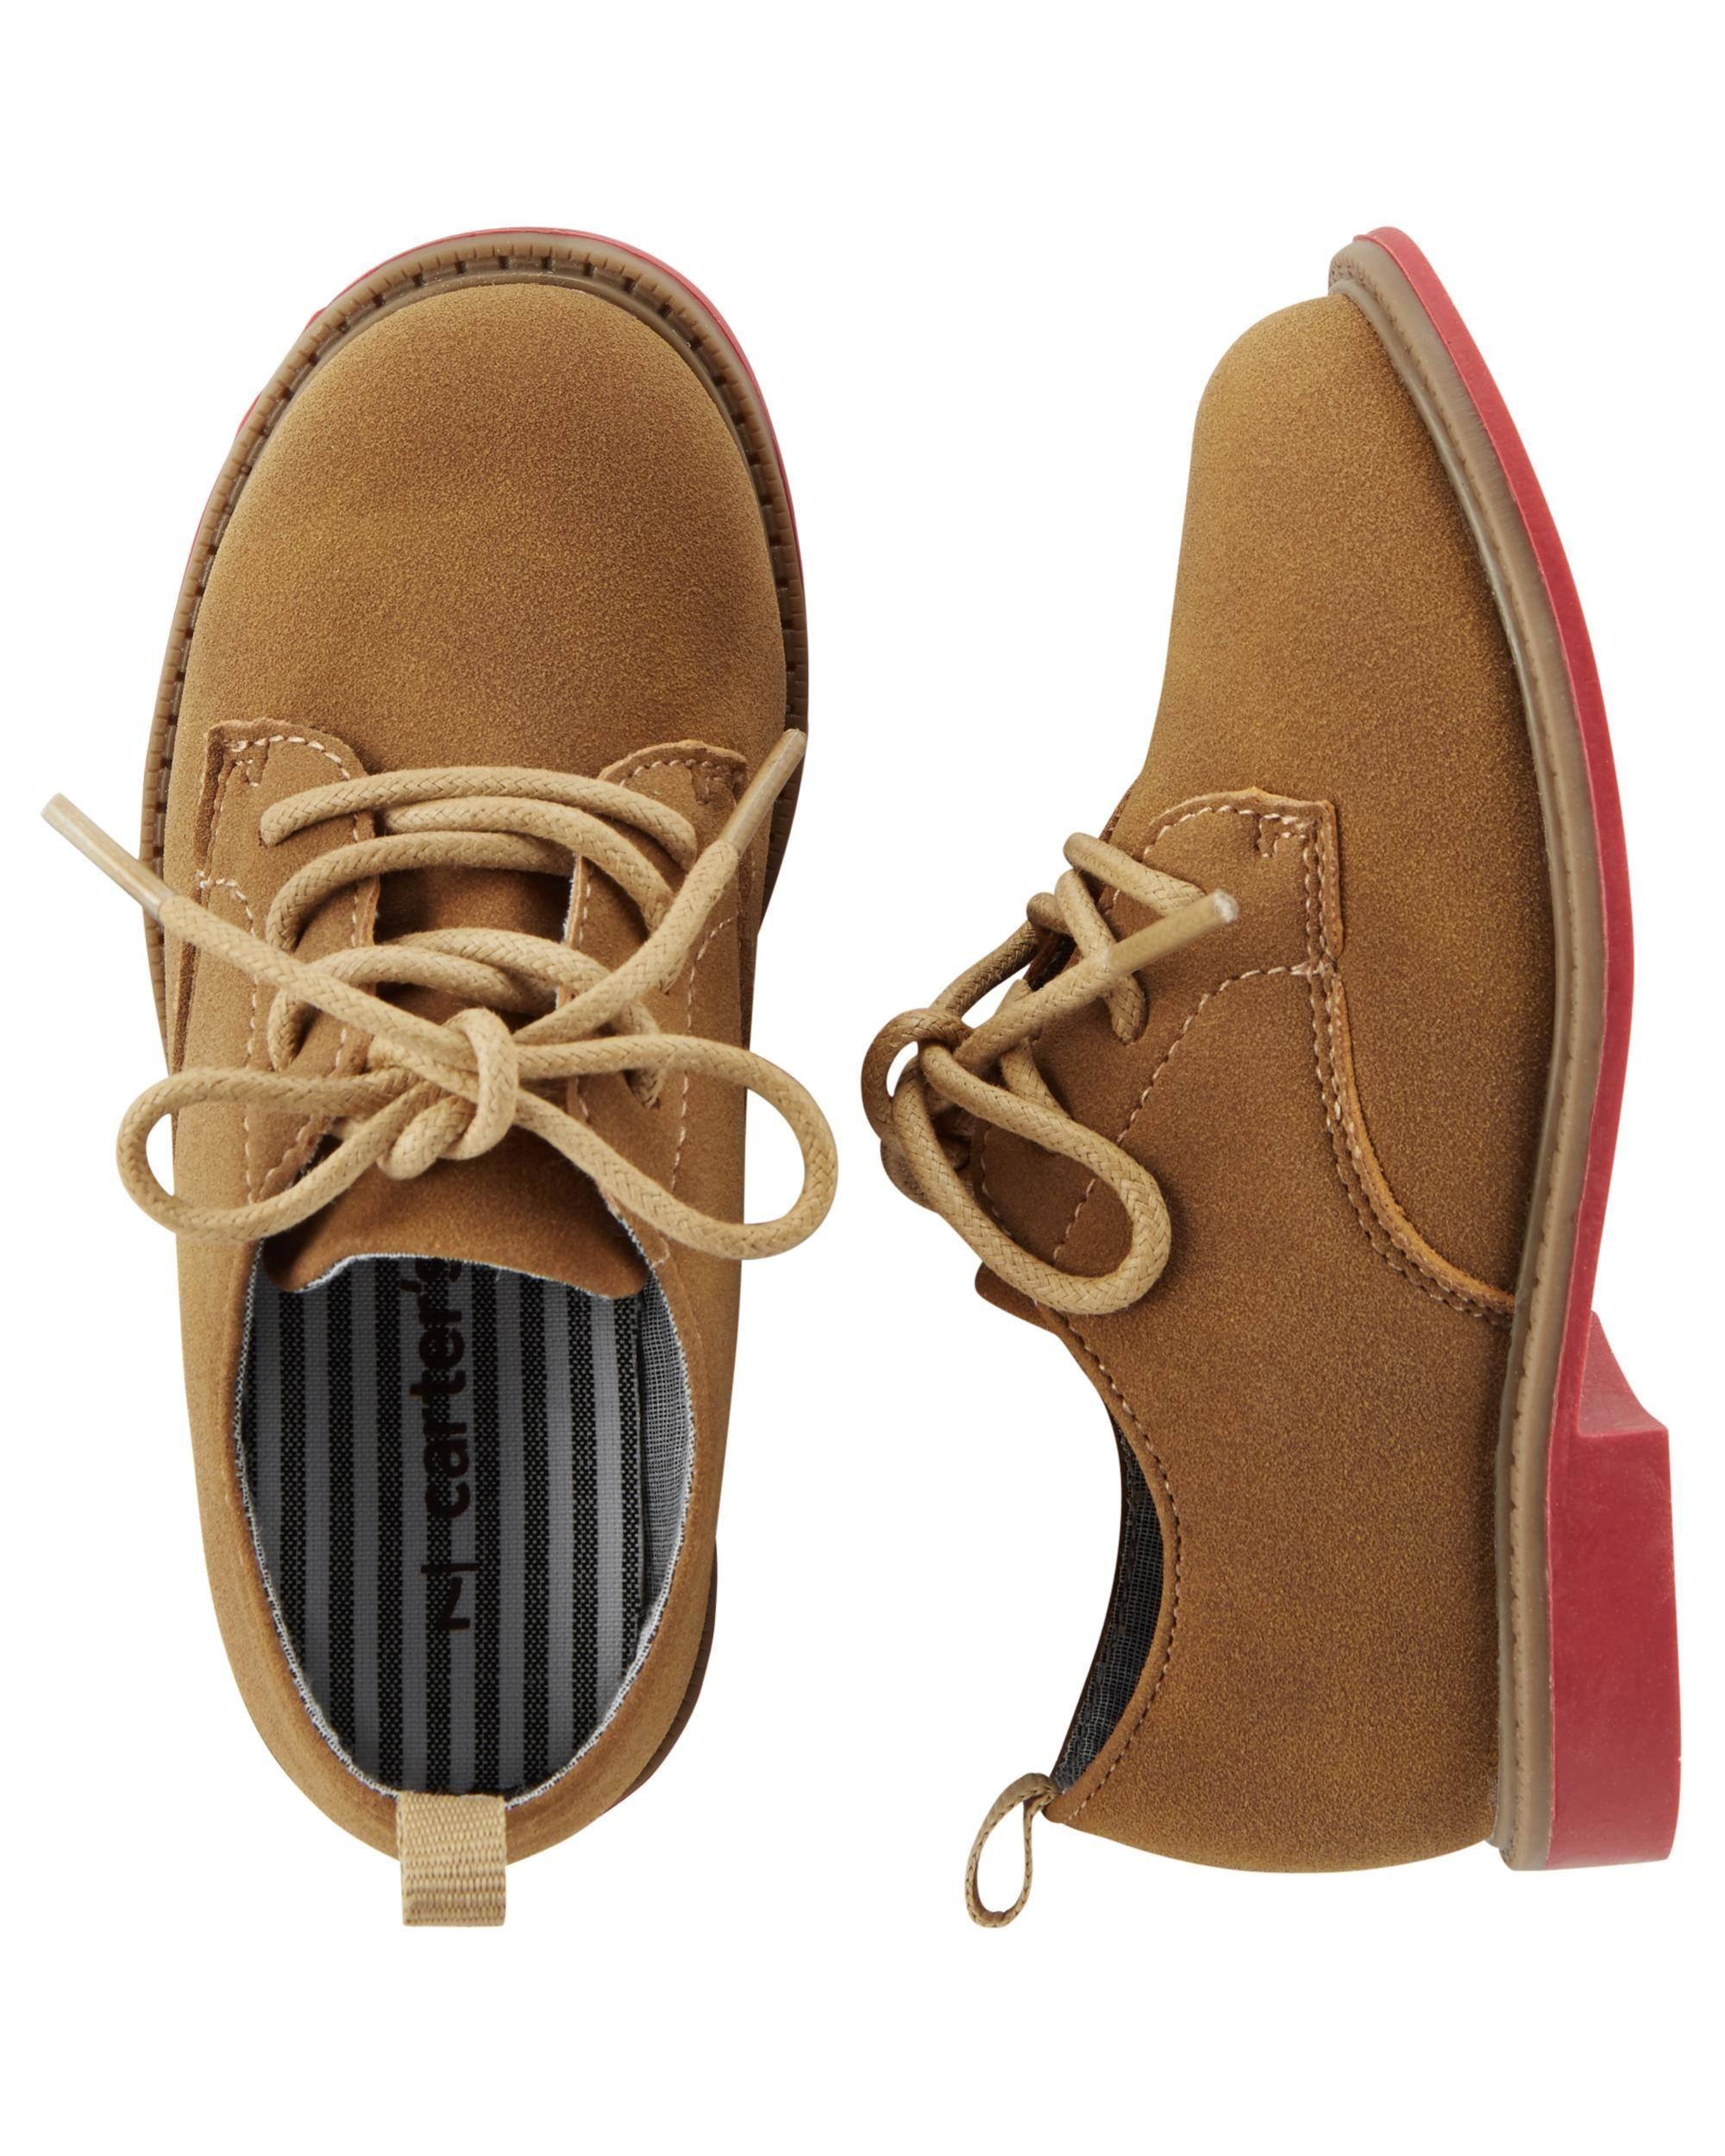 carters boy dress shoes